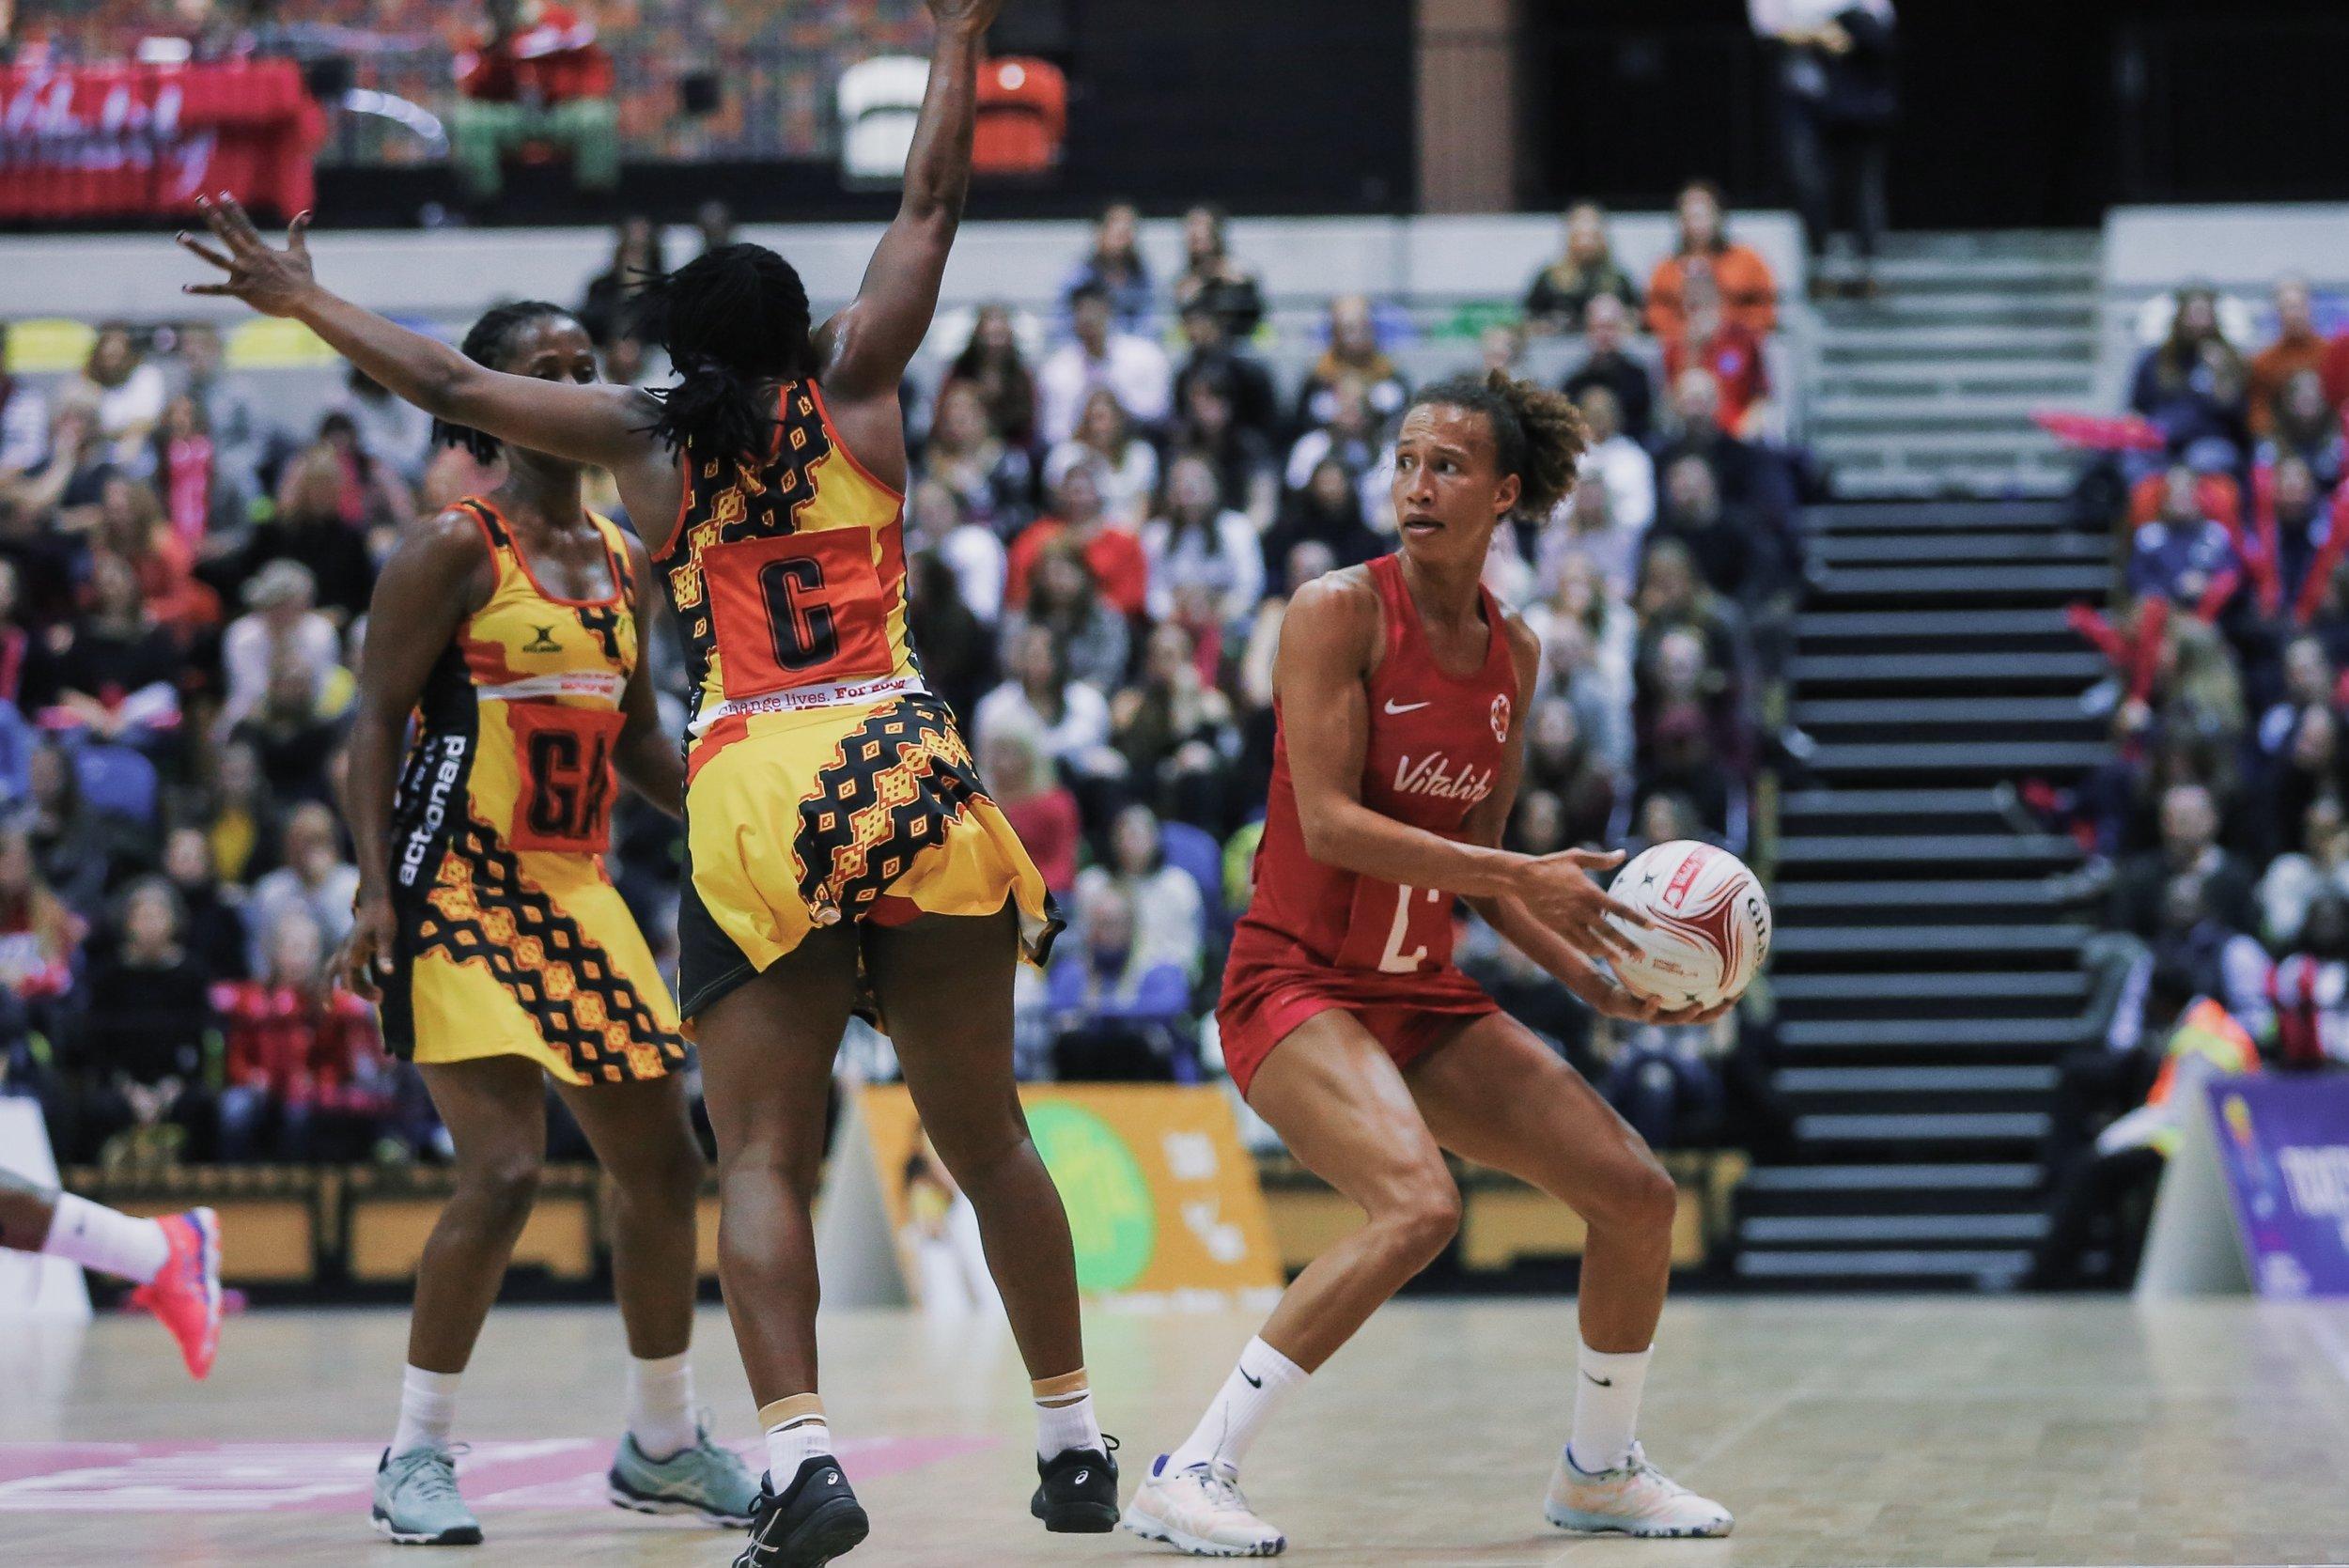 womens-netball-sport-england-uganda-international-series-18.jpg